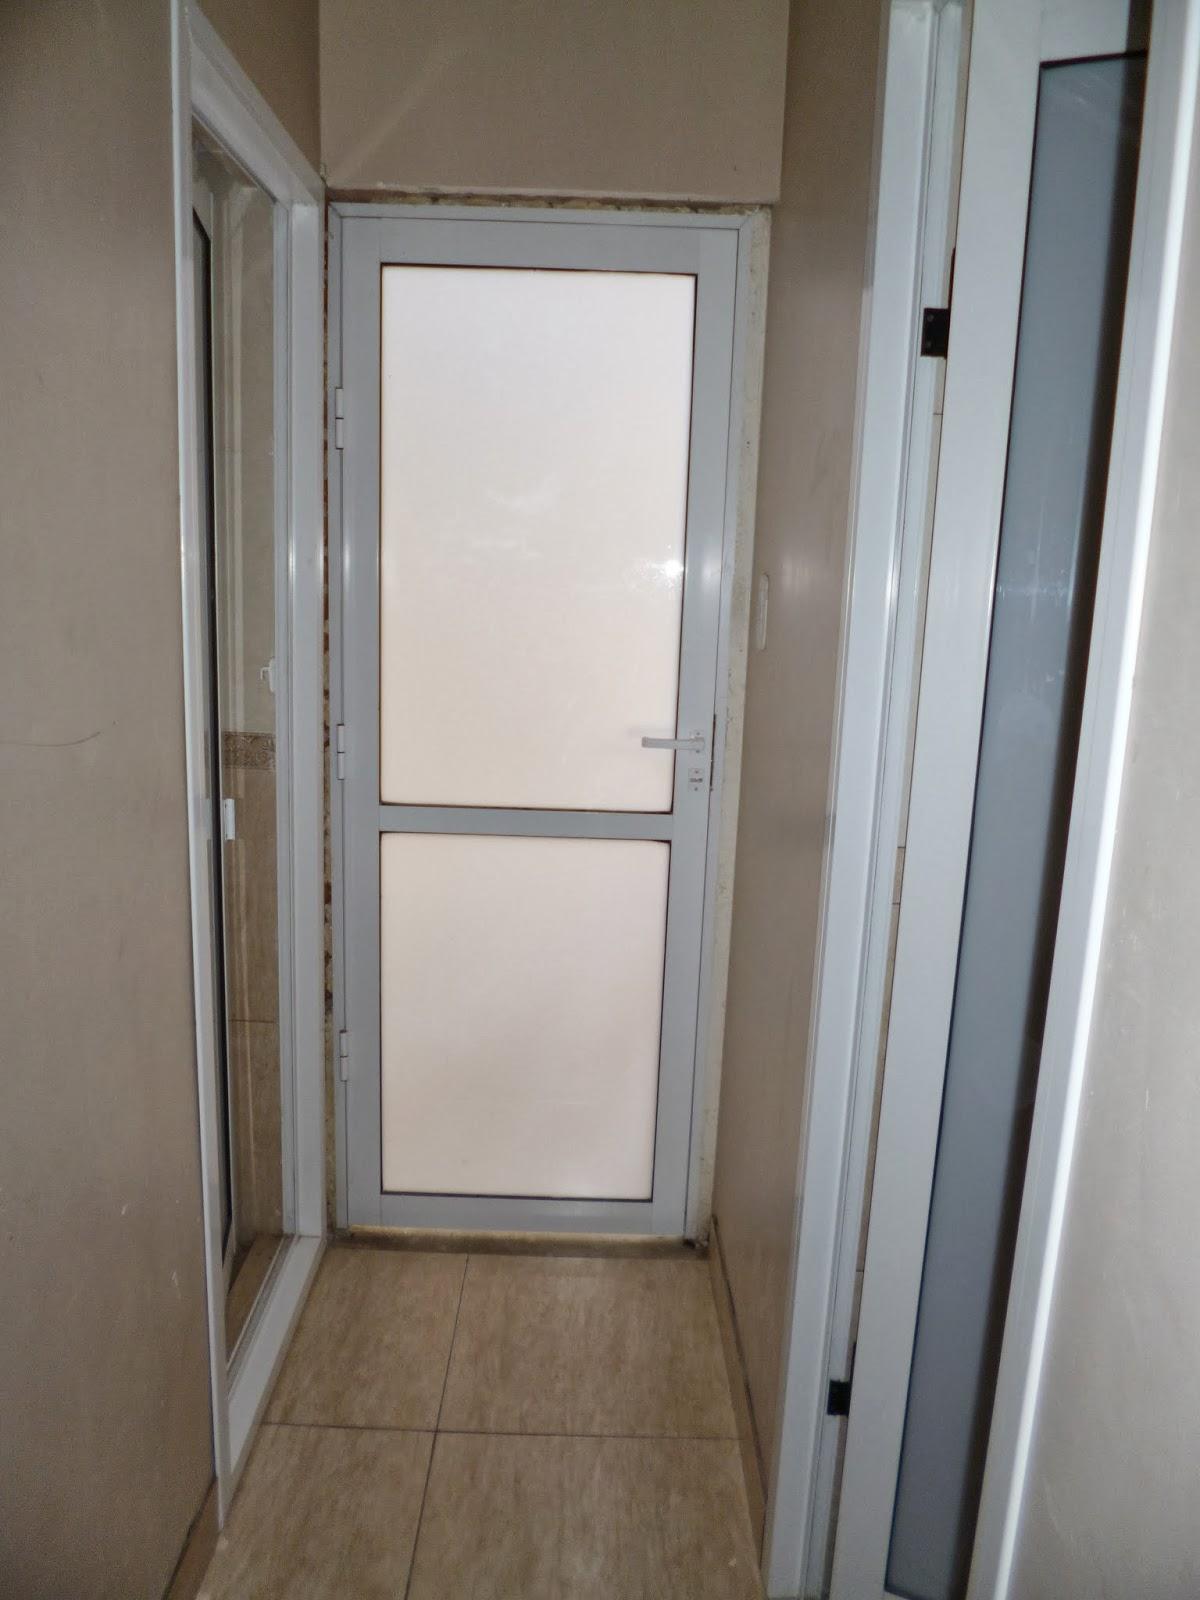 puertas de aluminio para ba o sencillas